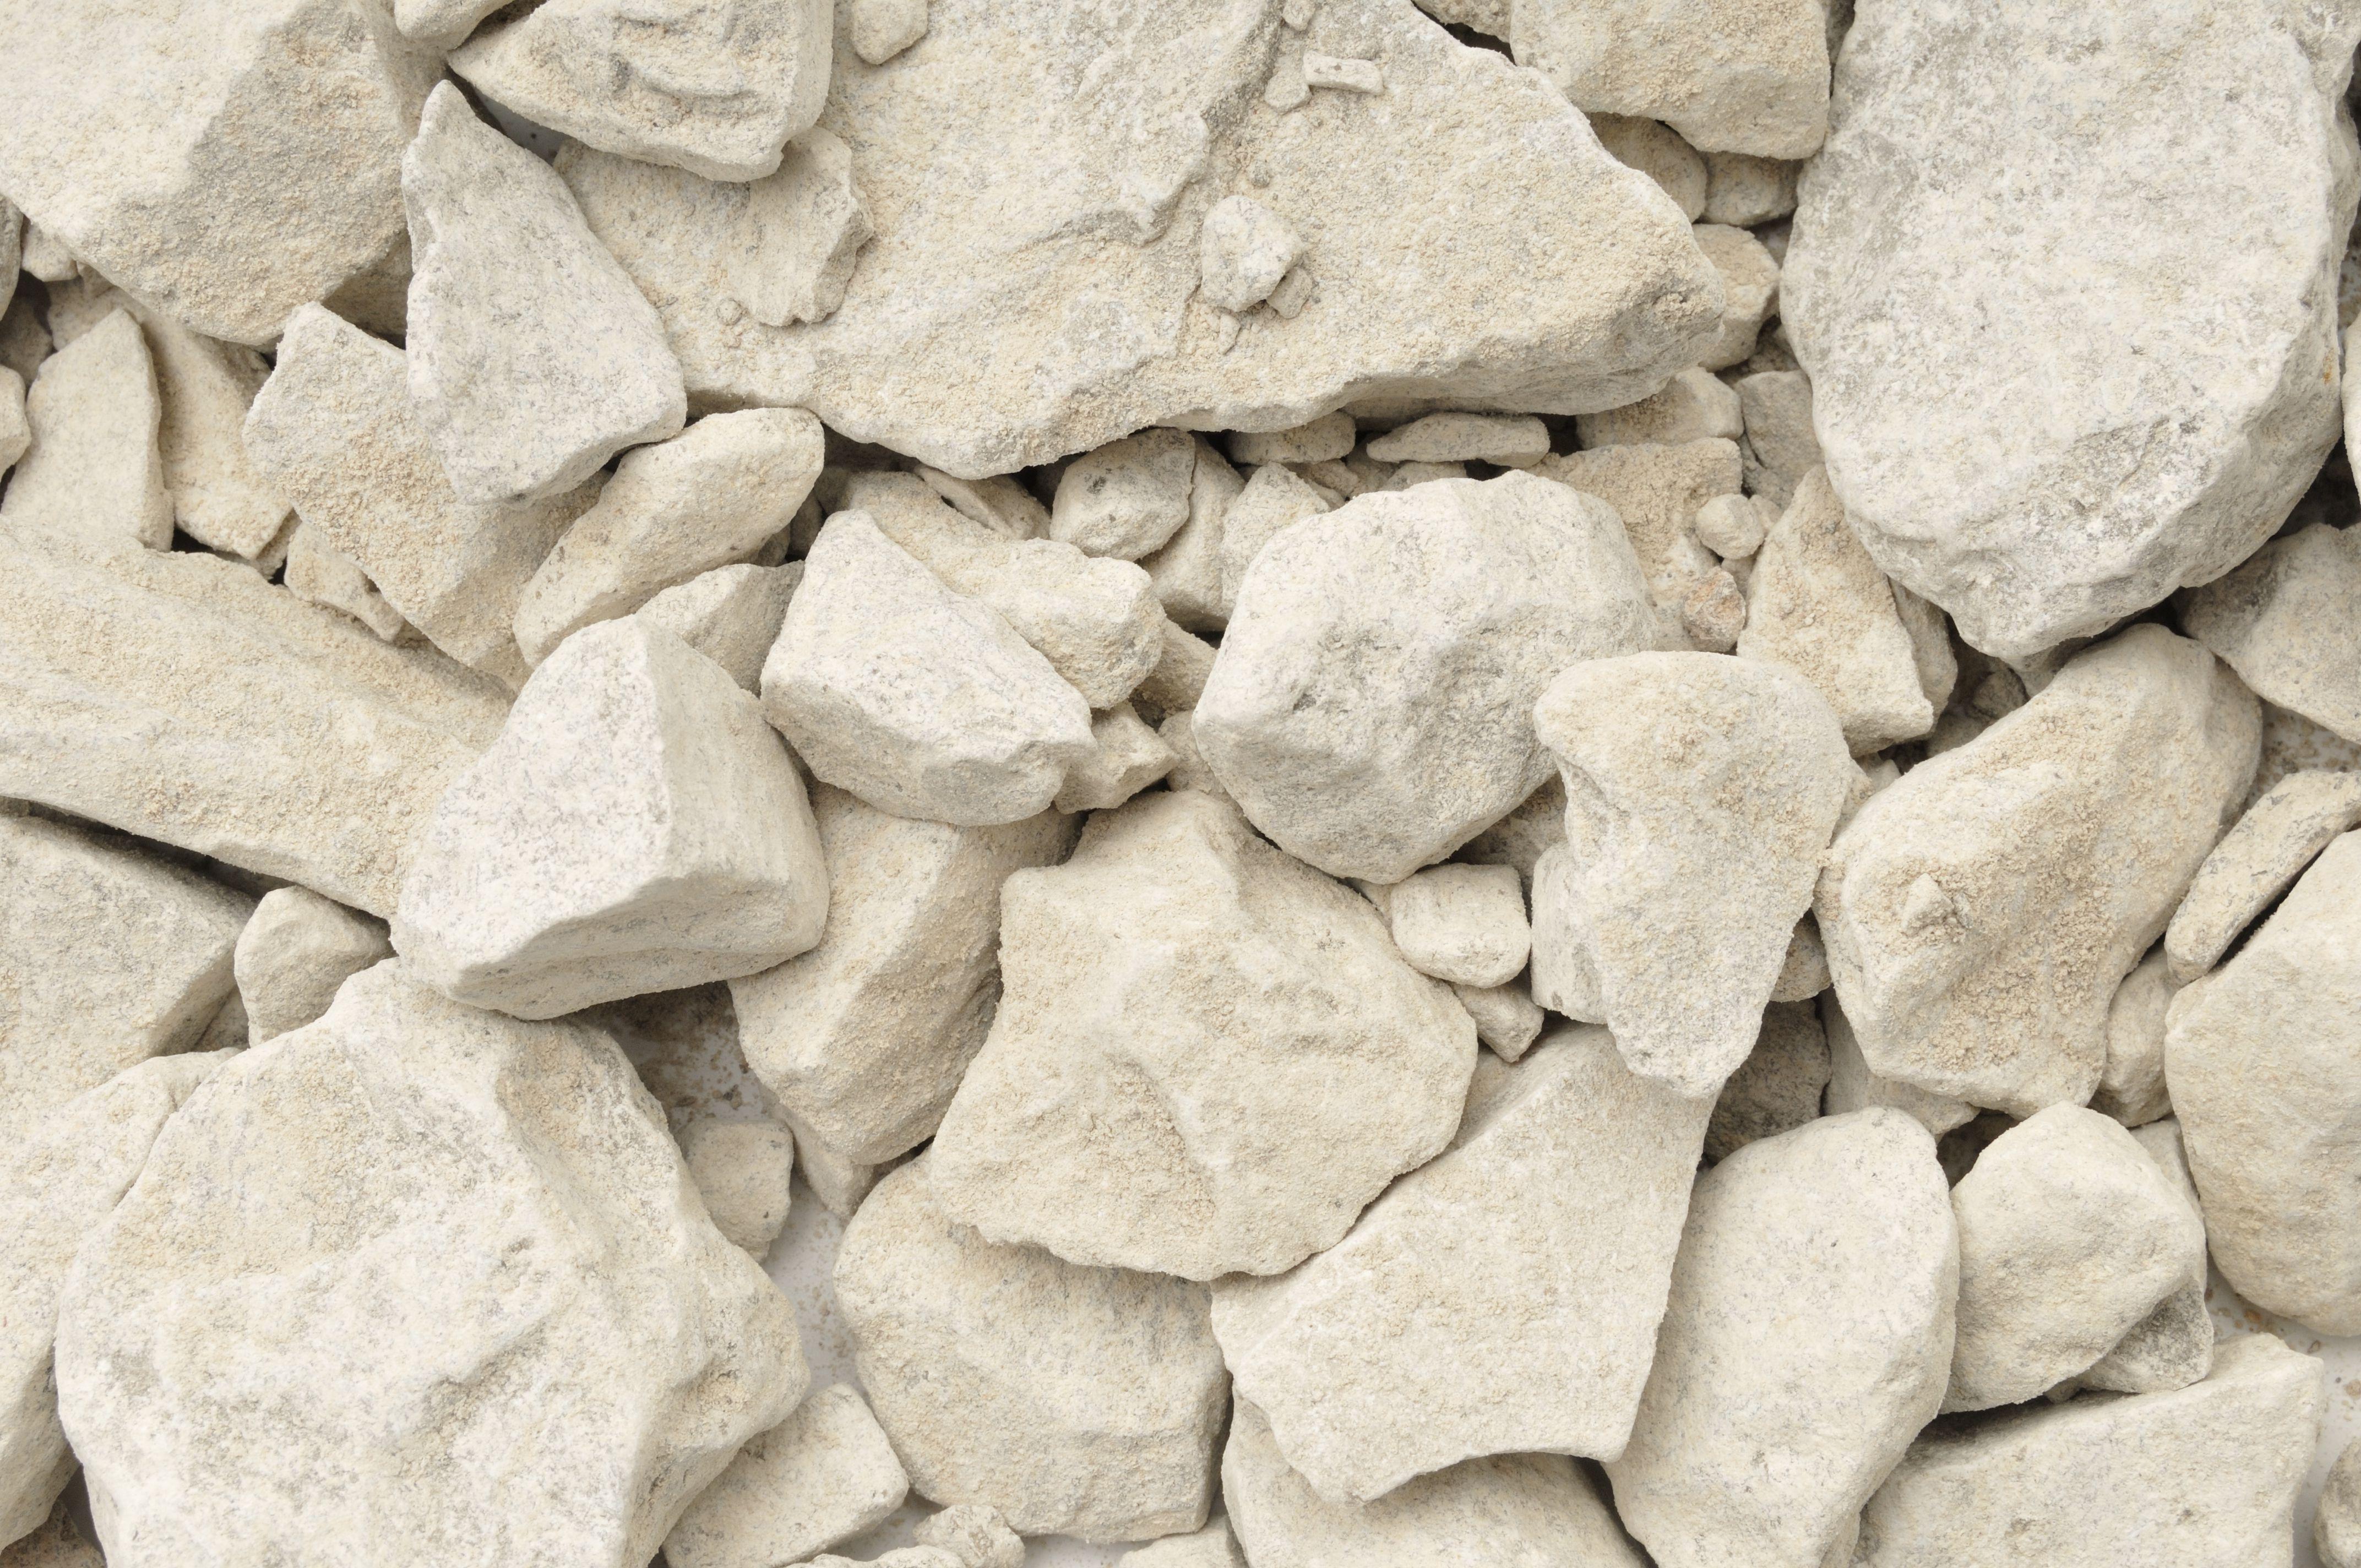 Choosing Rocks To Build Stone Walls